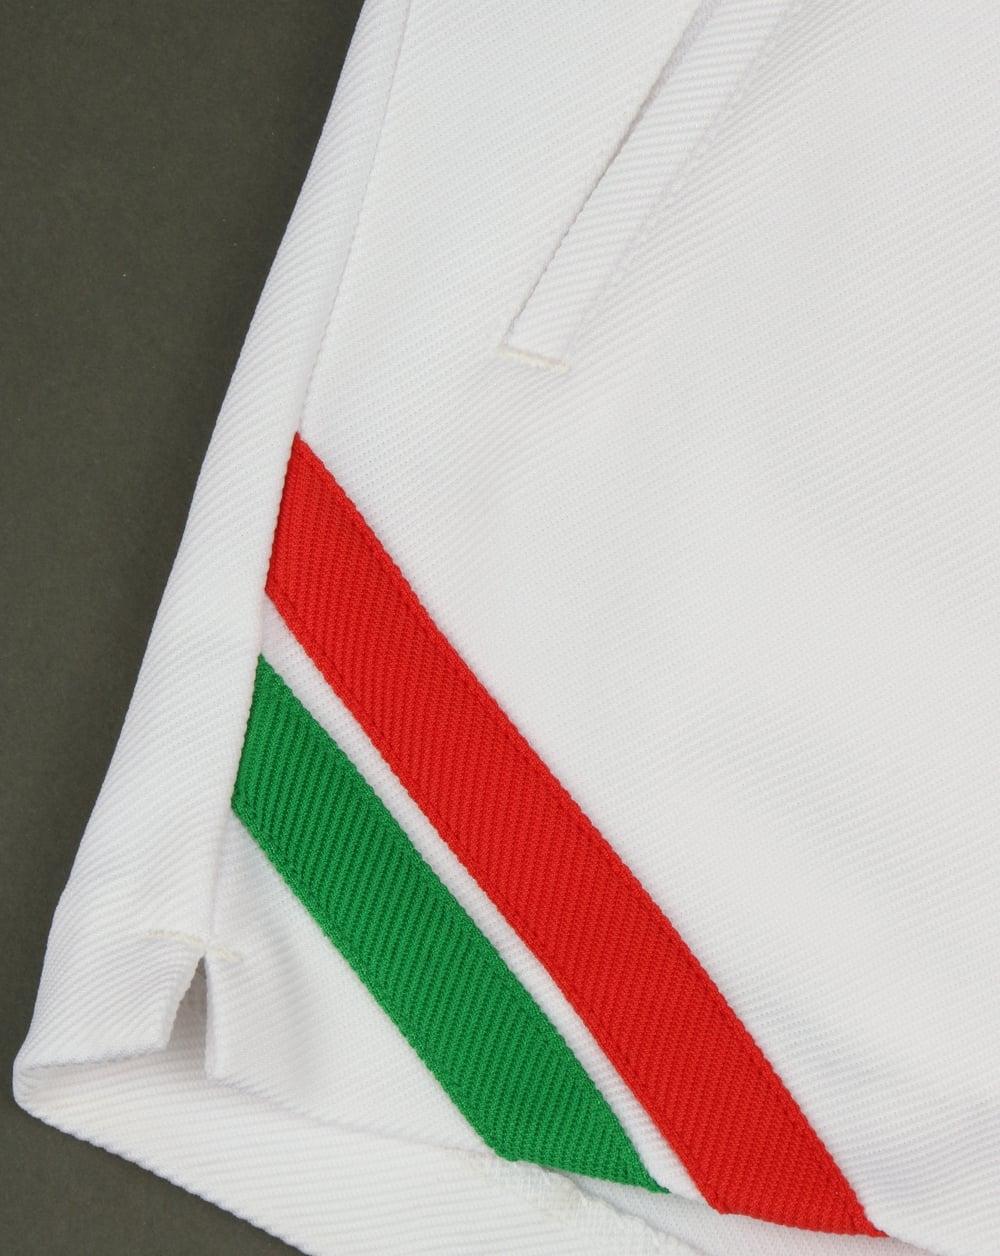 f18c33892018f Sergio Tacchini Time Shorts White,tennis,sports,retro,mens